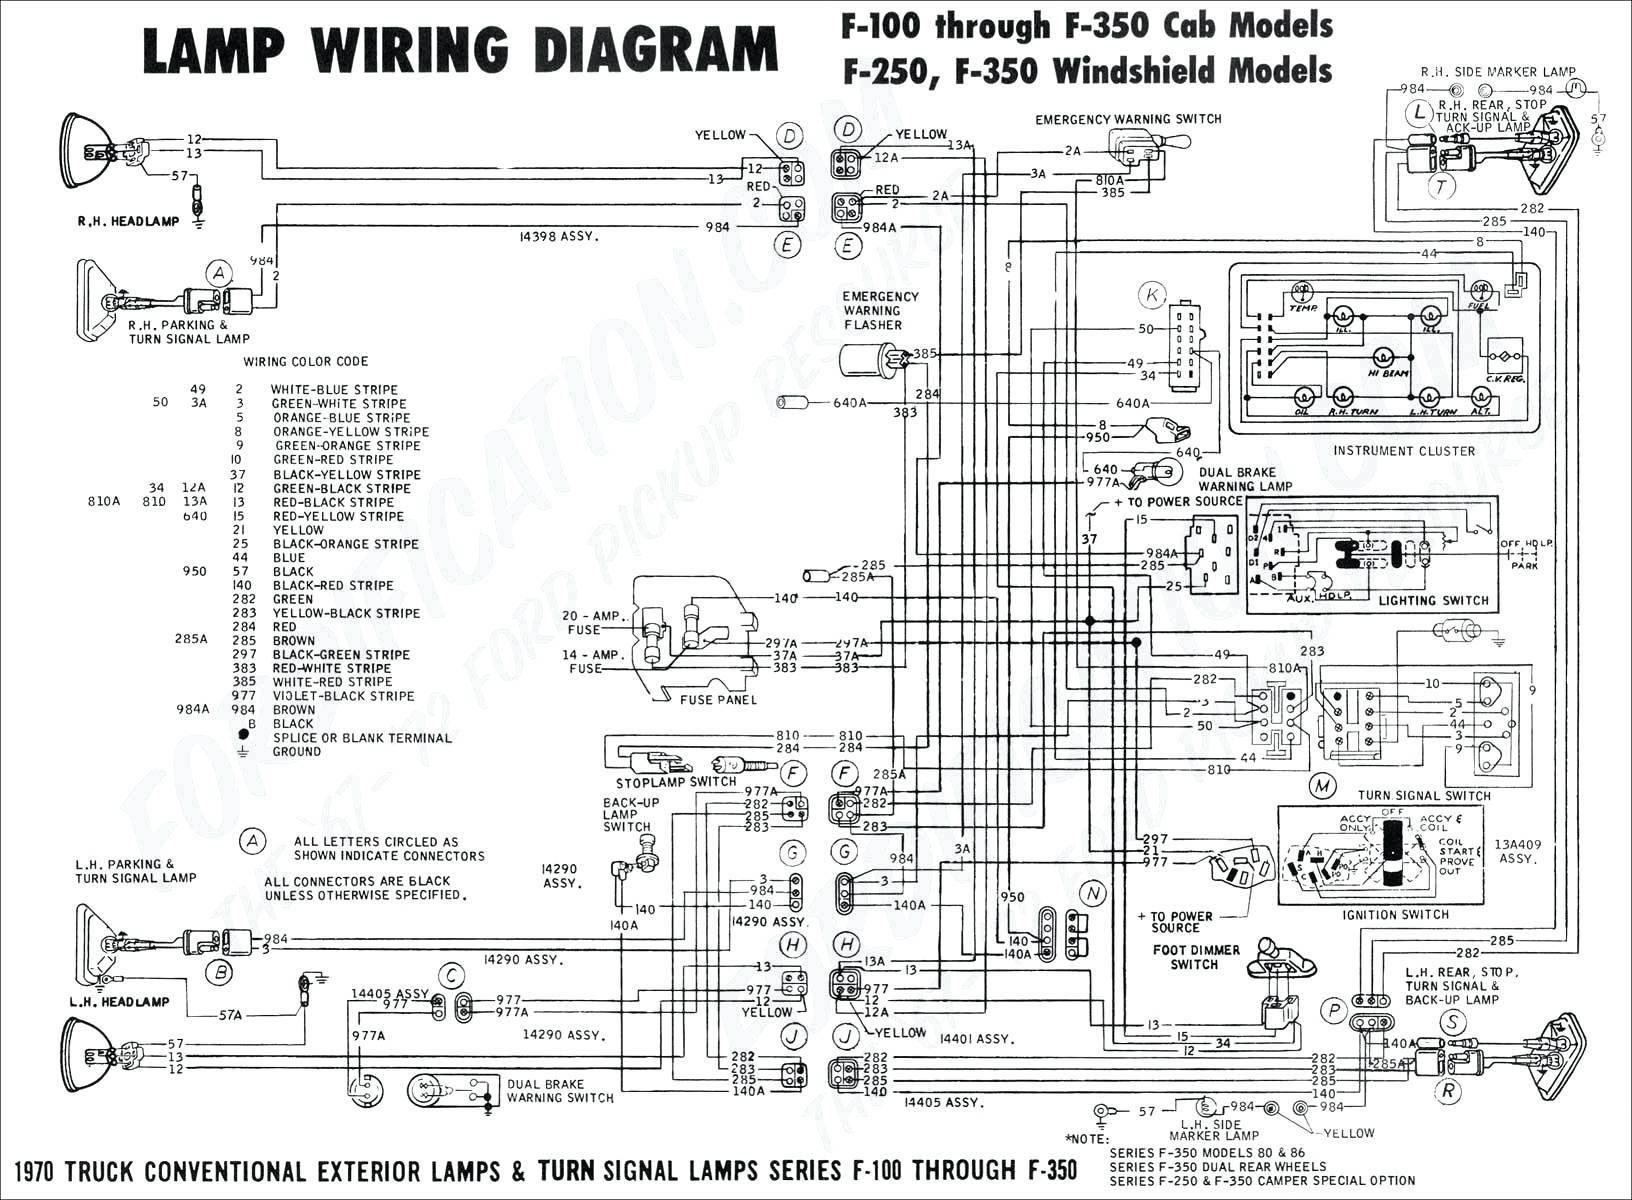 2003 Chevy Malibu Engine Diagram Luxury 2003 Chevy Tahoe Fuel Pump You Ll Love Of 2003 Chevy Malibu Engine Diagram